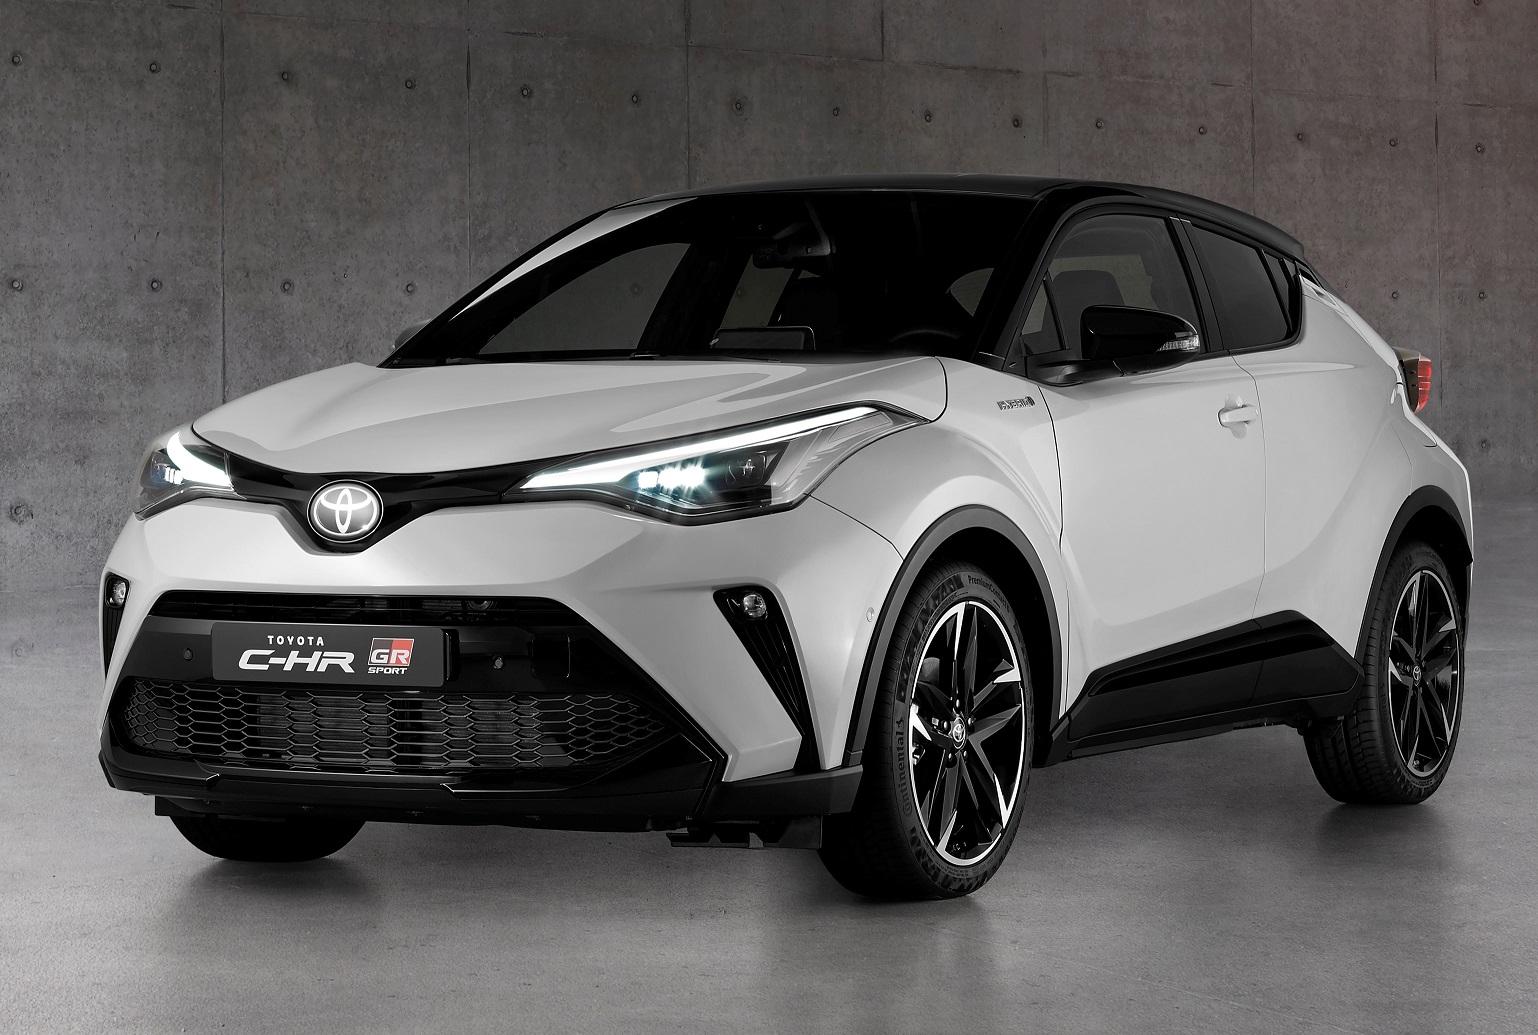 New Toyota C-HR hybrid gets debut